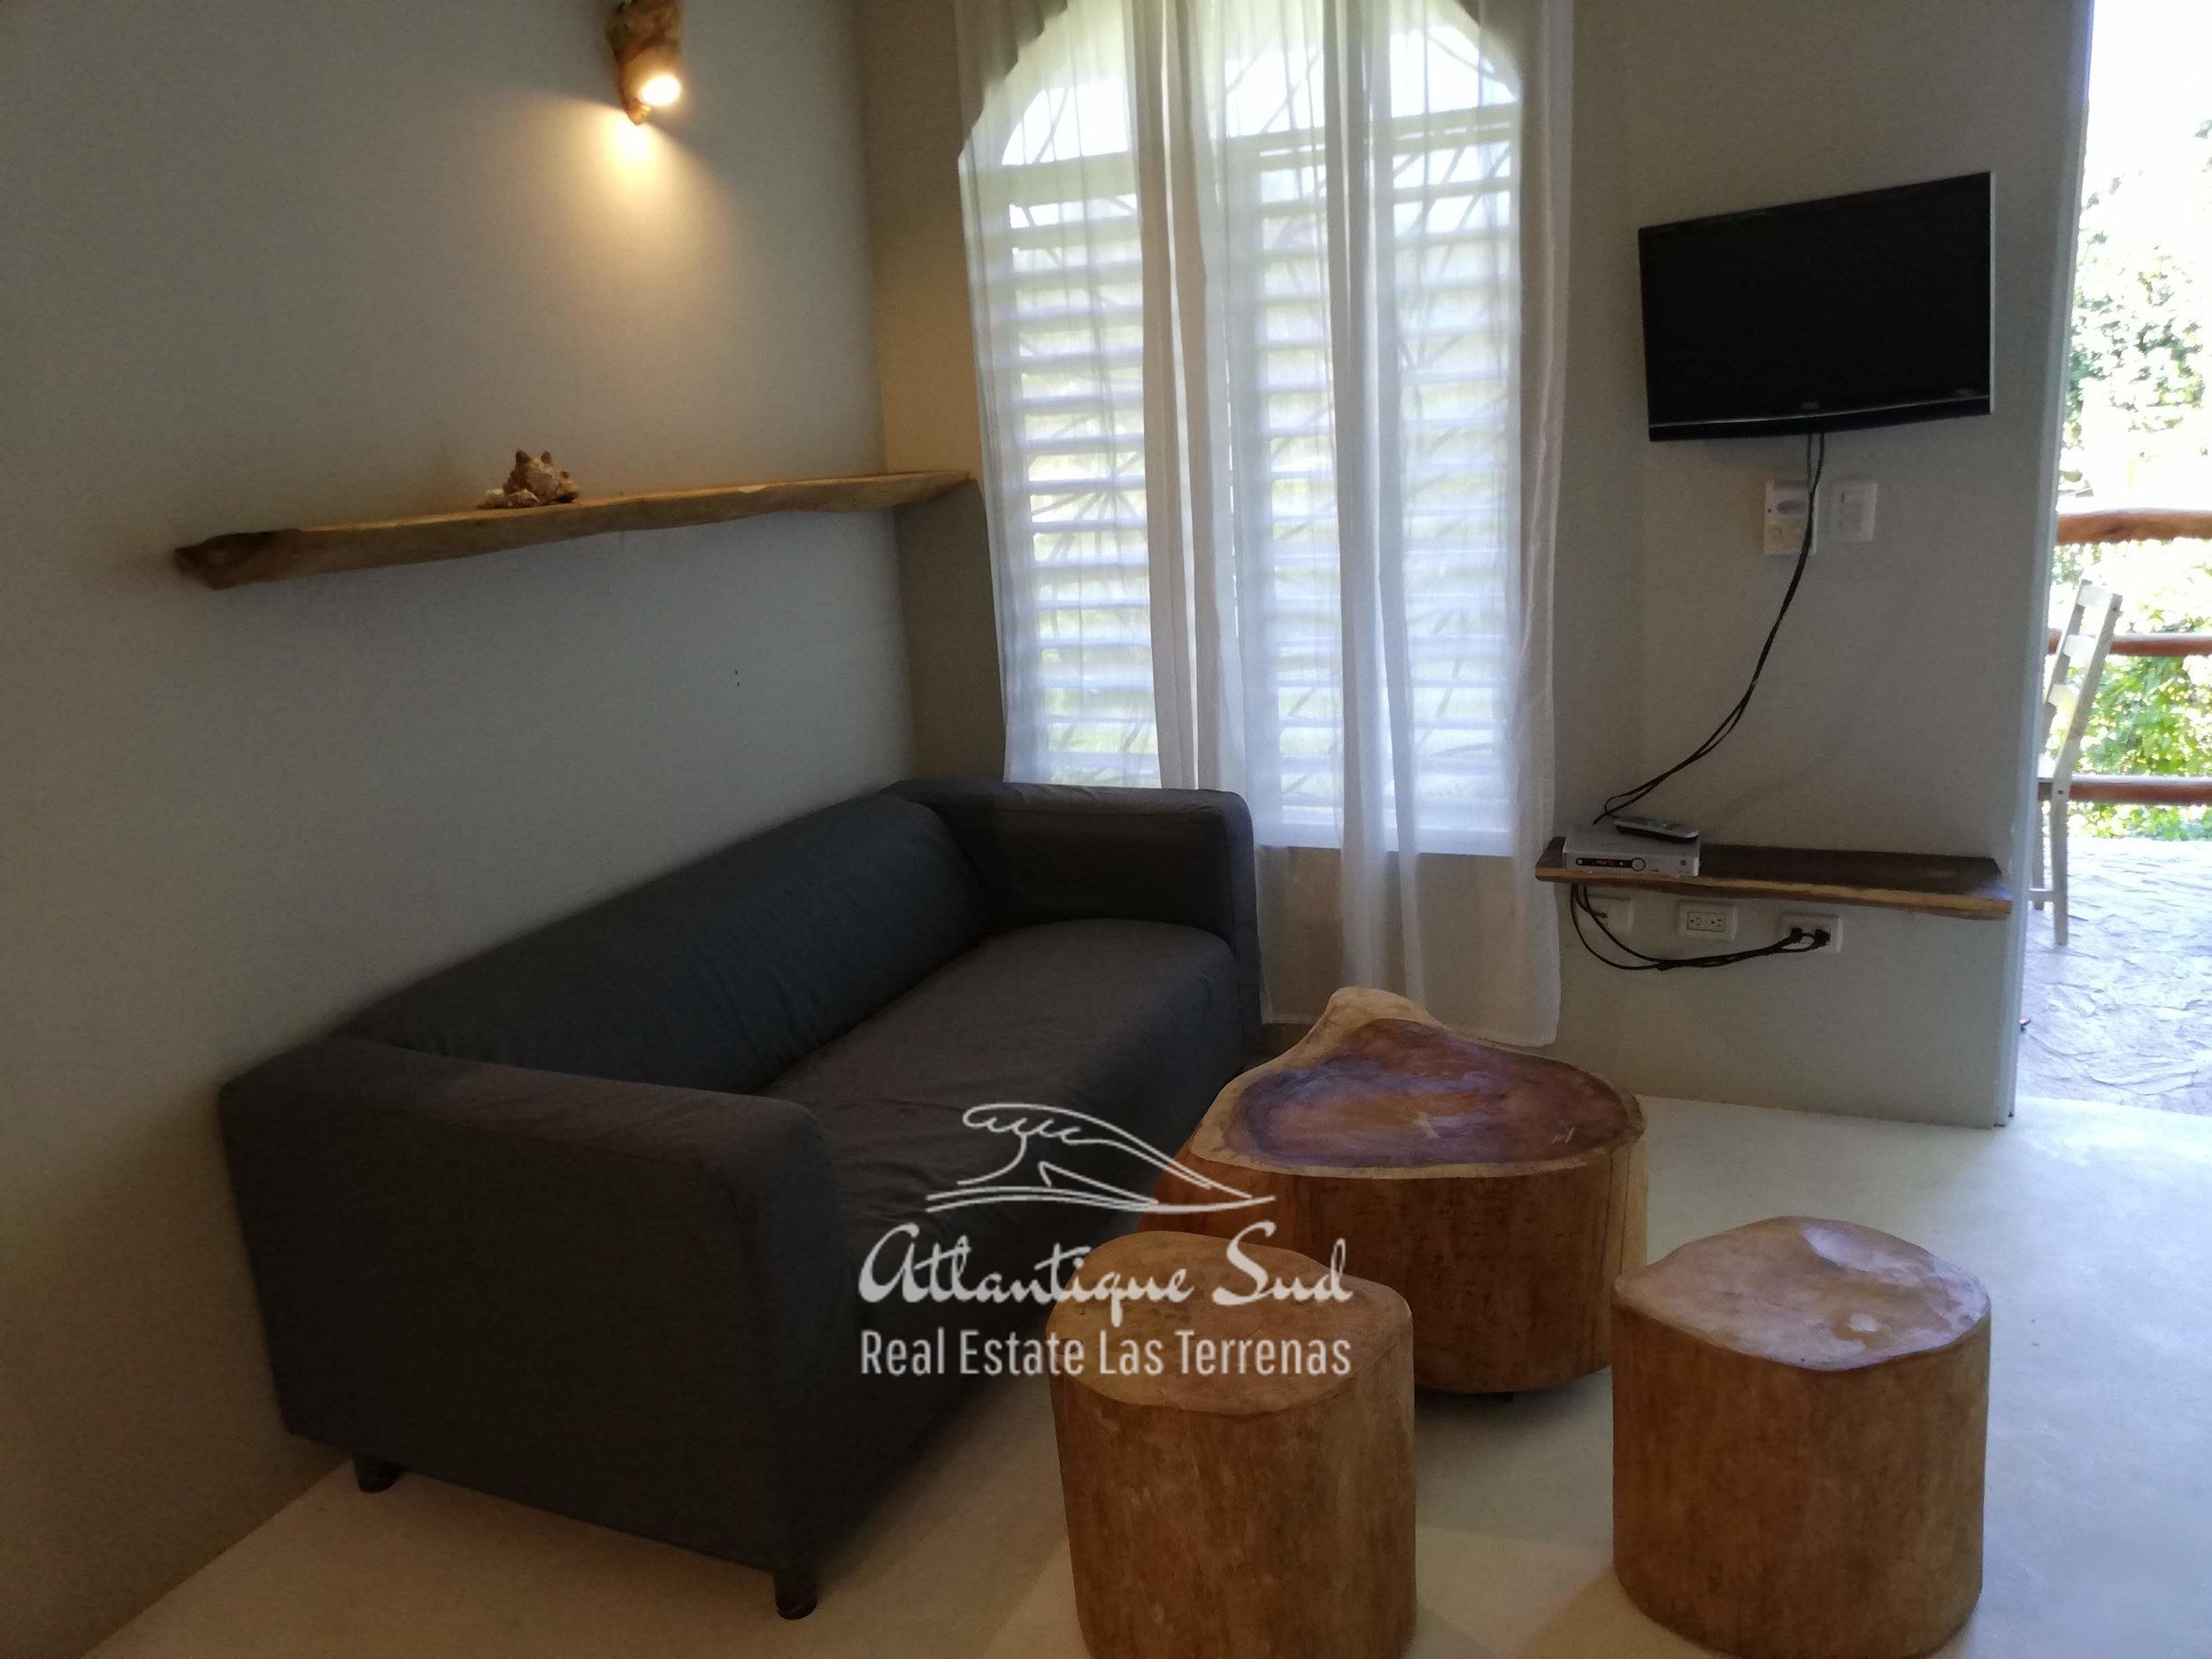 Typical caribbean hotel for sale Real Estate Las Terrenas Dominican Republic Atlantique Sud27.jpg